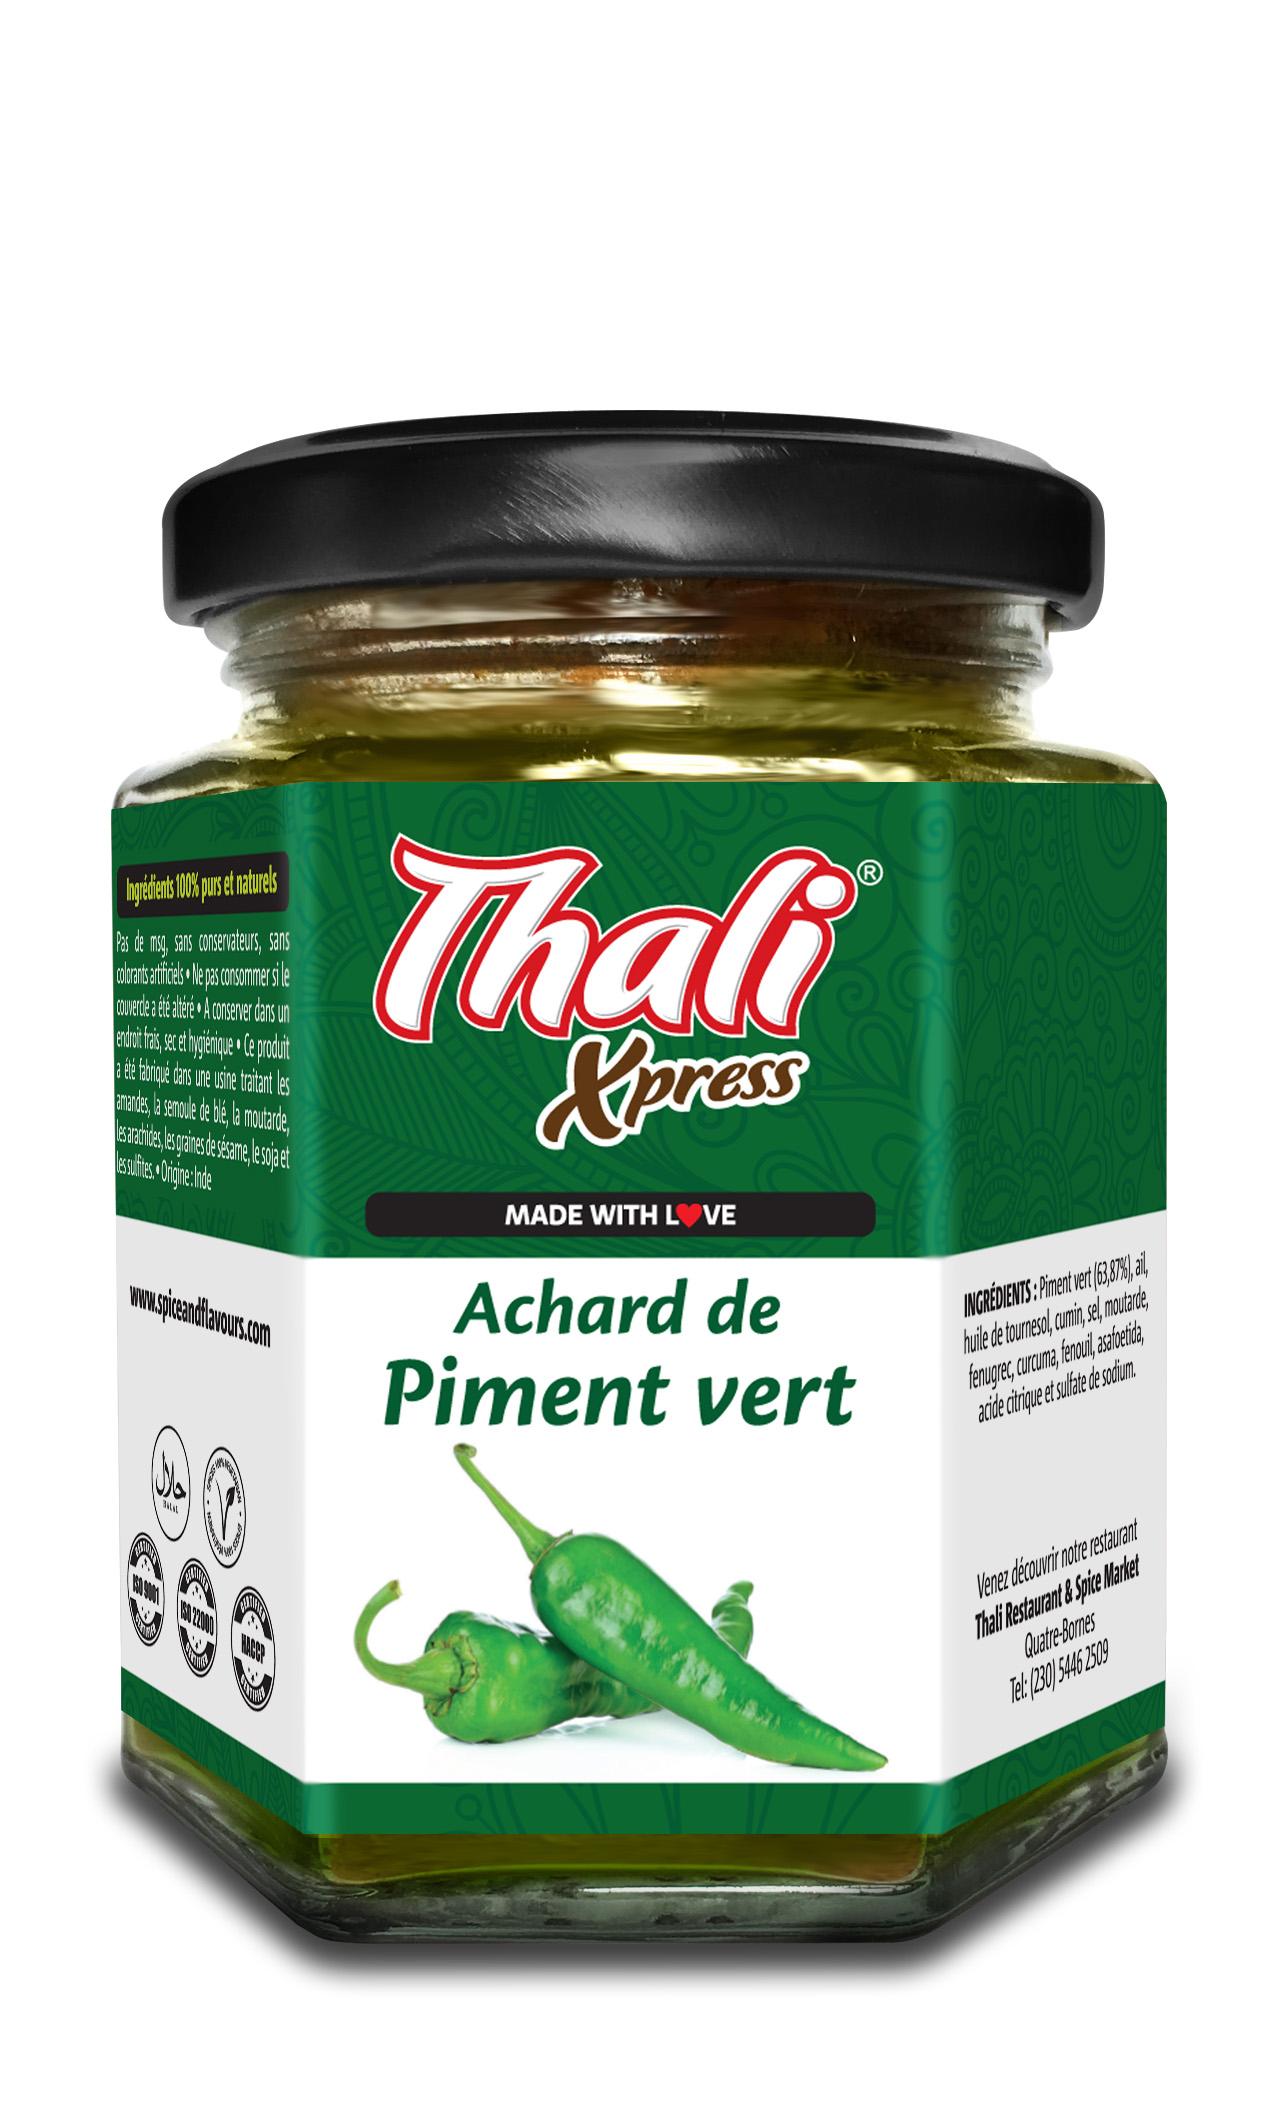 Achard de Piment vert Image